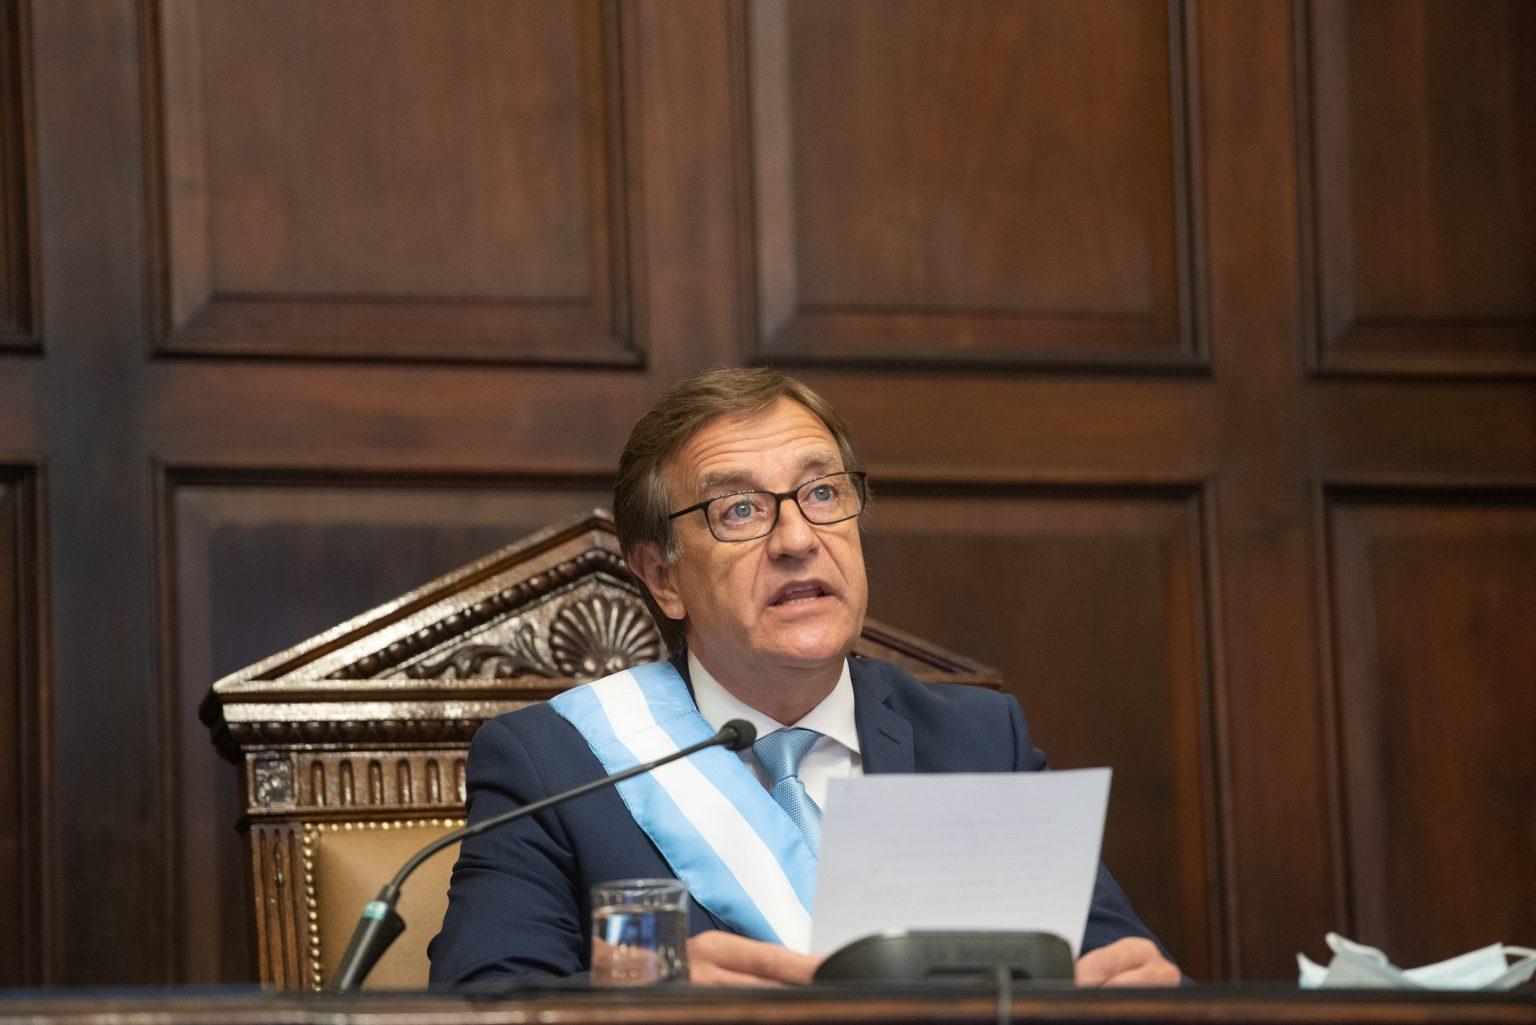 Suárez inaugura hoy asamblea legislativa/ Titulares de Mendoza